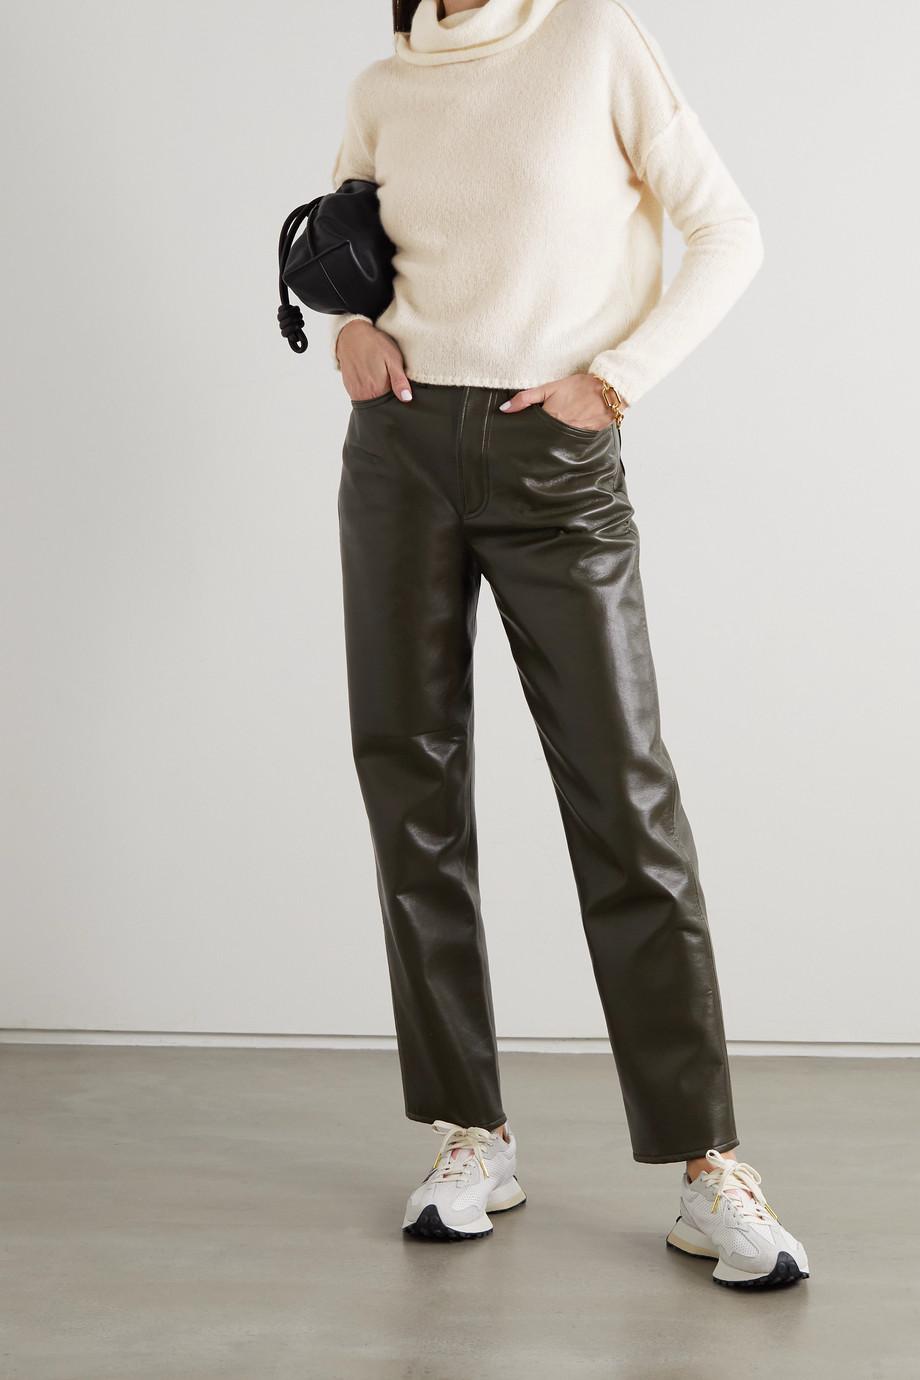 James Perse Cashmere turtleneck sweater